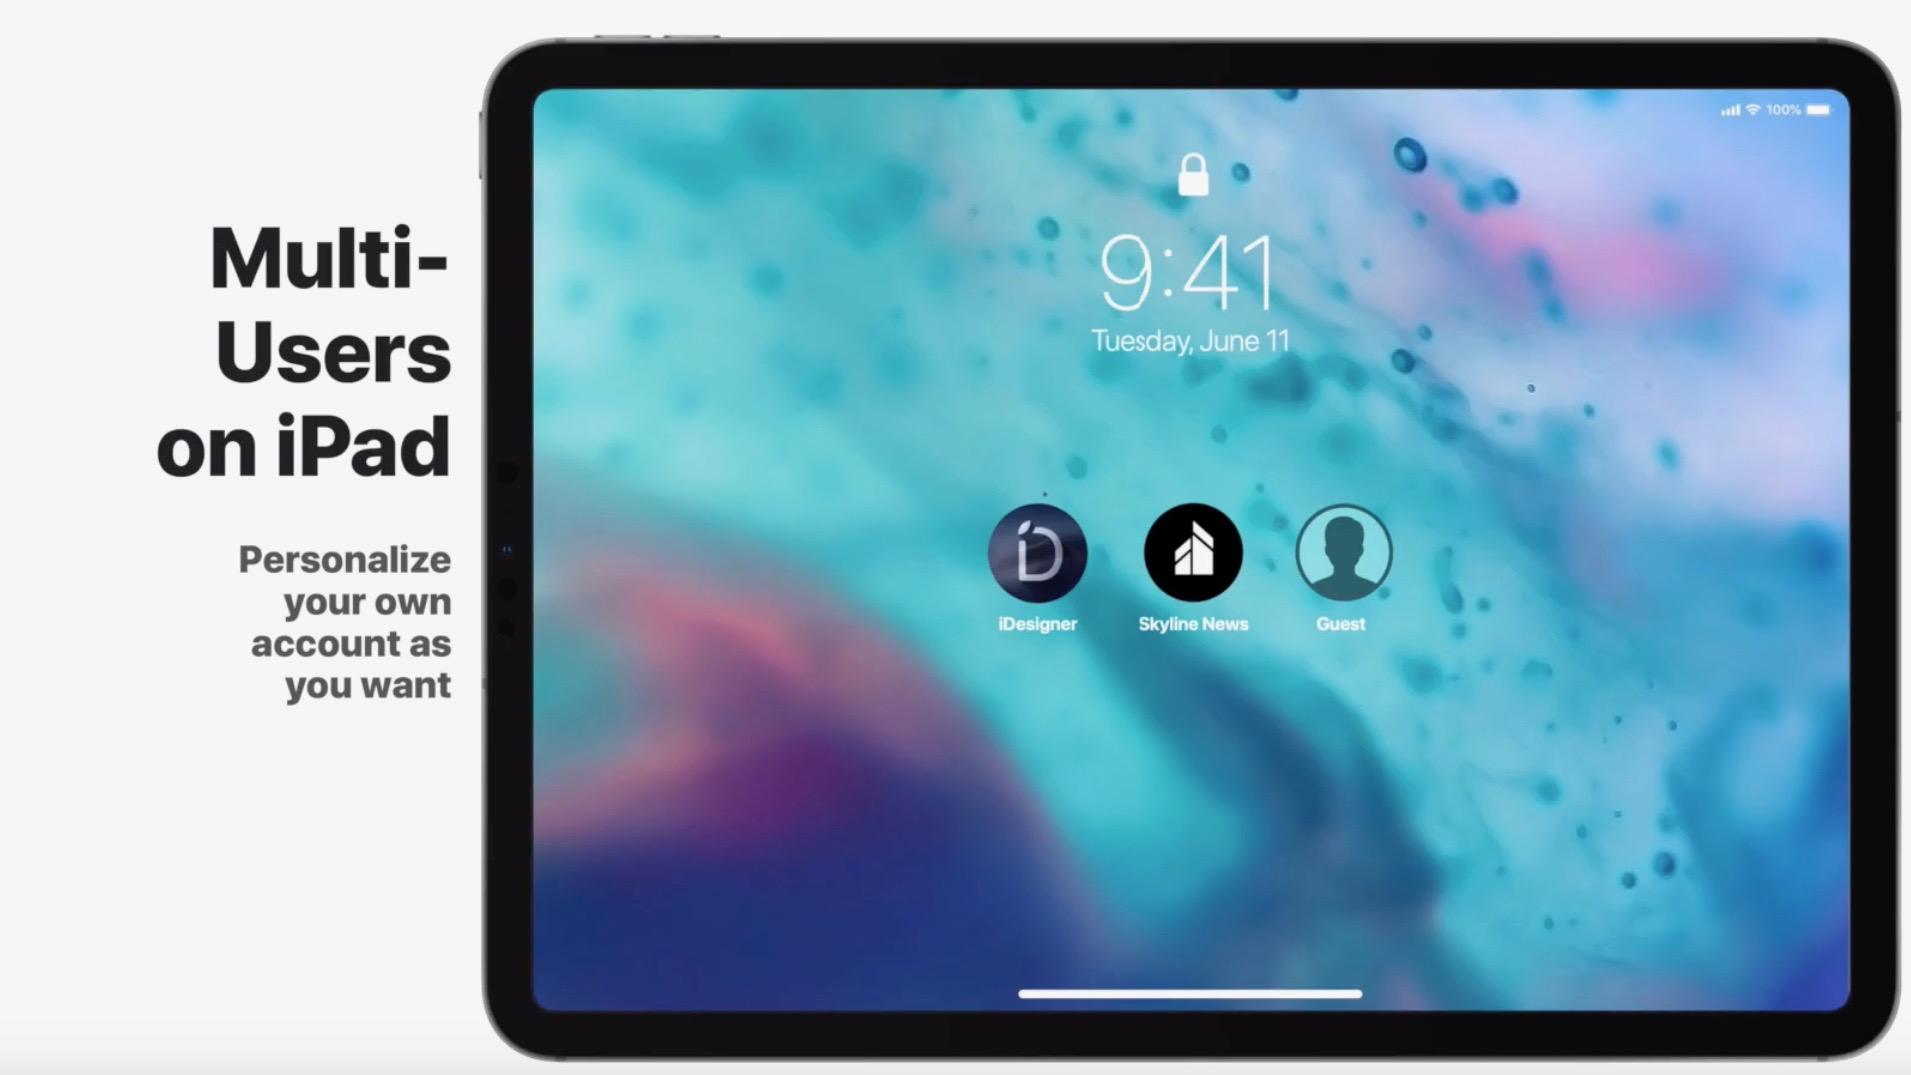 iOS 13 concept imagines Dark Mode, multi-user iPad support, less intrusive Siri, and more [Video]